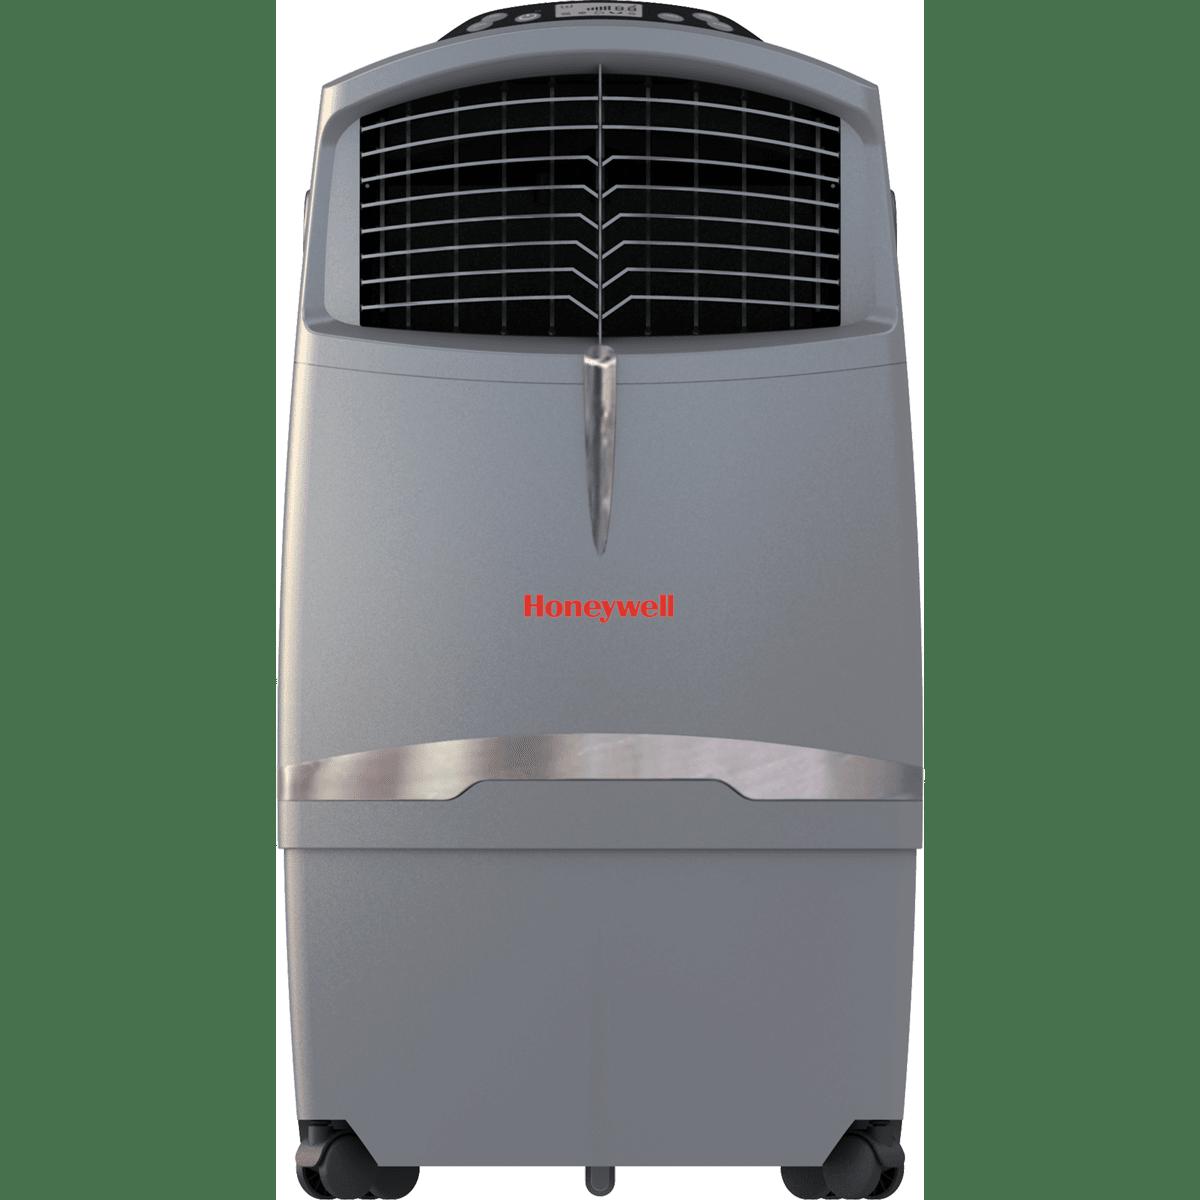 Honeywell 525 CFM Portable Evaporative Air Cooler ho3643